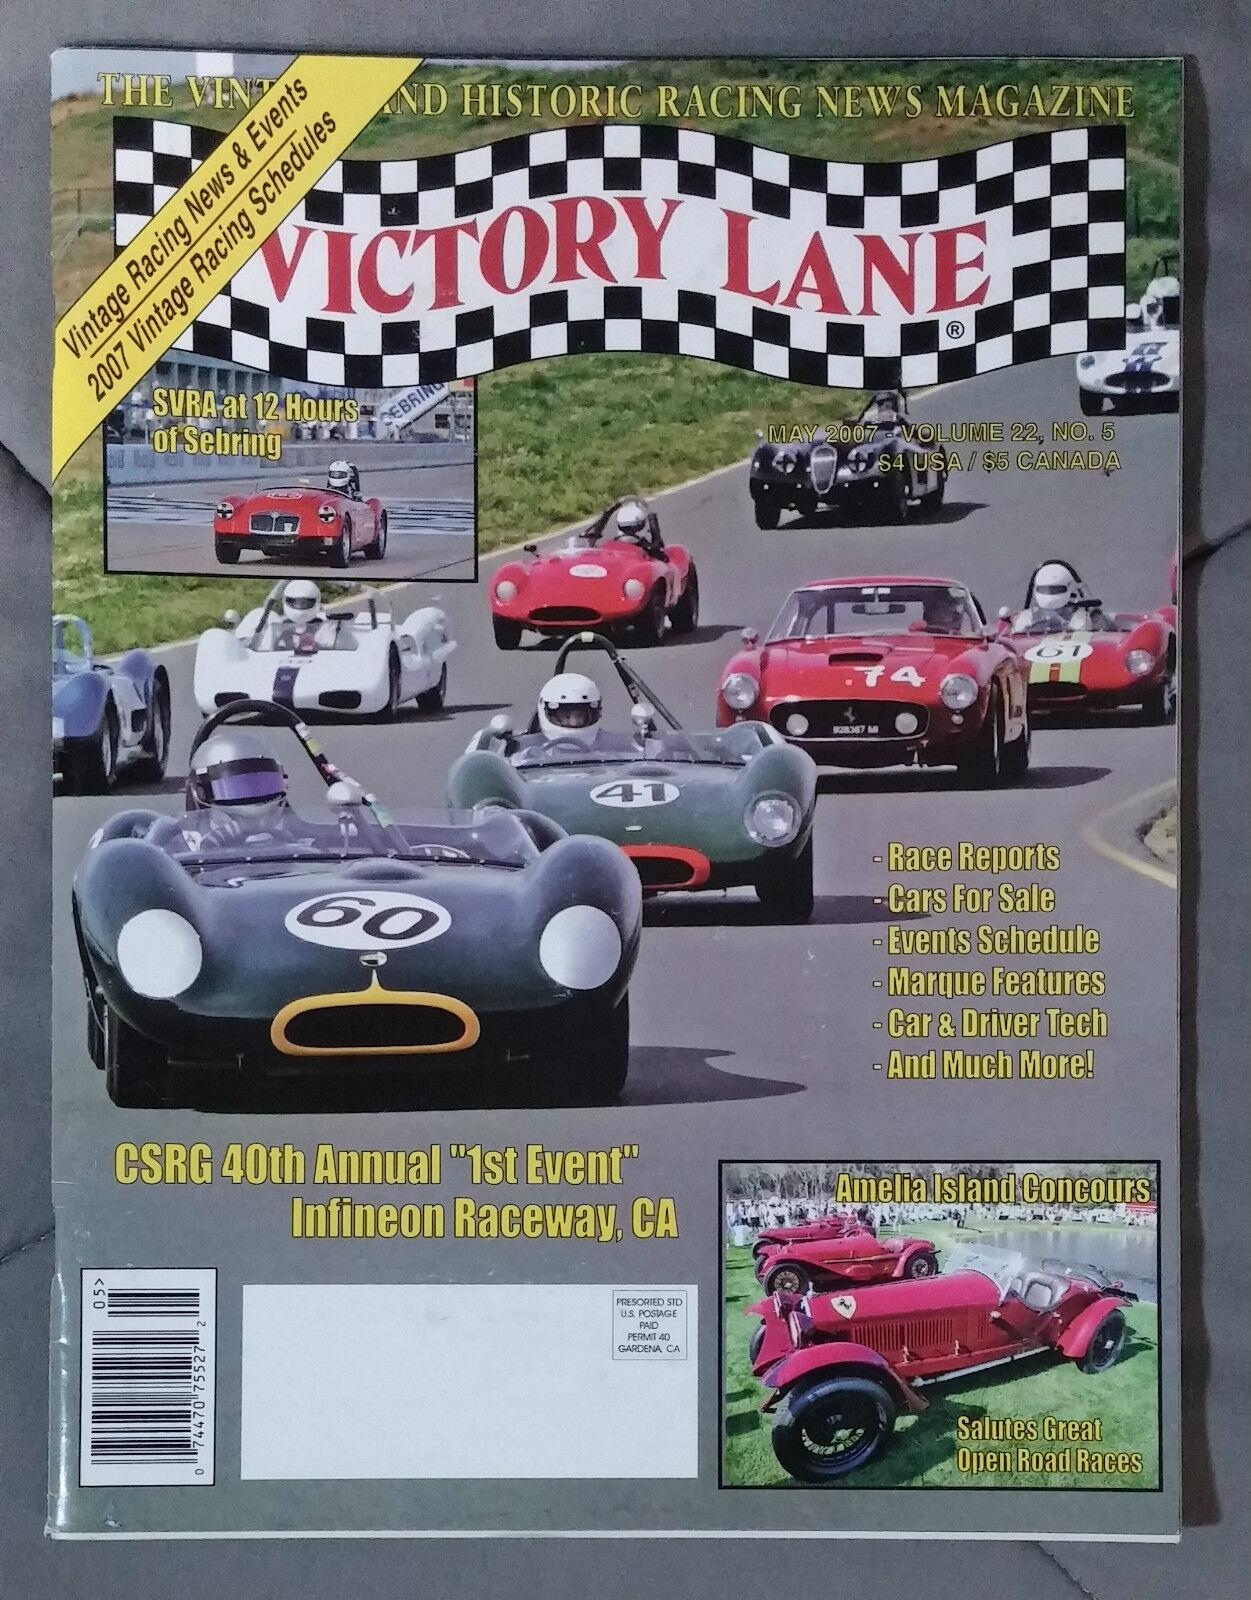 VICTORY LANE HISTORIC RACING NEWS VINTAGE MAGAZINE 2007 MAY CSRG ...